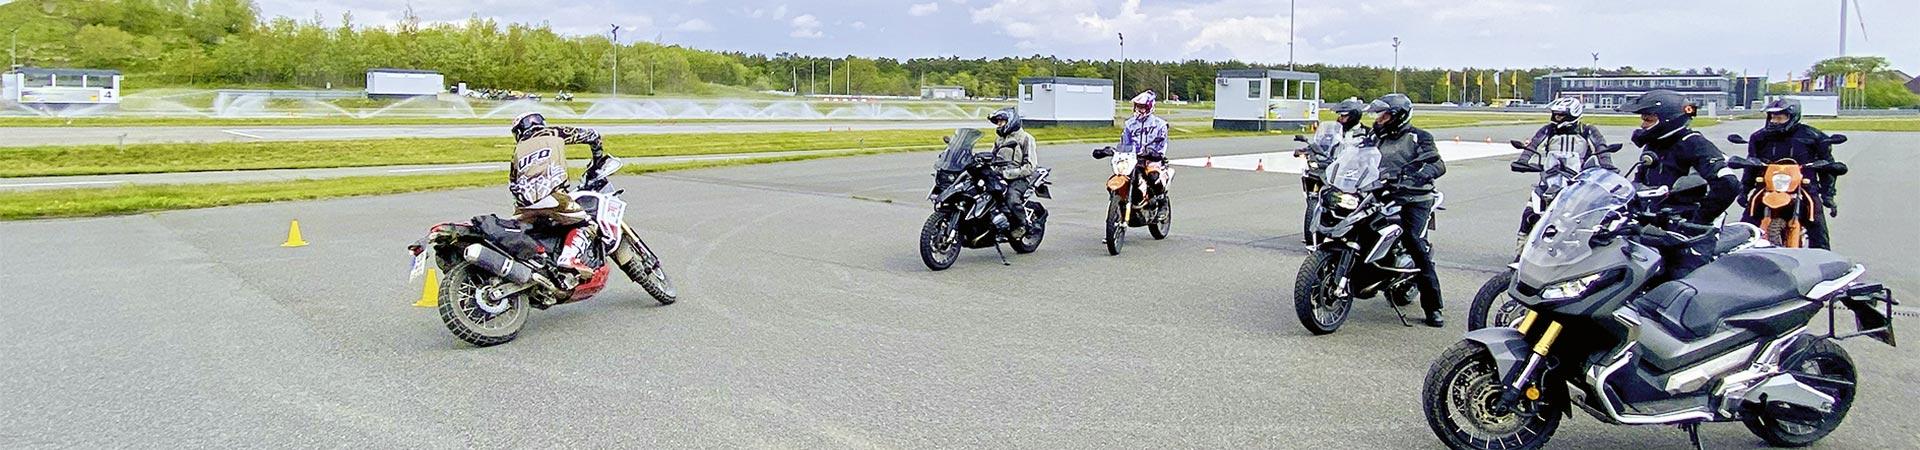 Titelbild-ADAC-Hansa-Adventure-Bike-Training_27-05-2021_1aae9